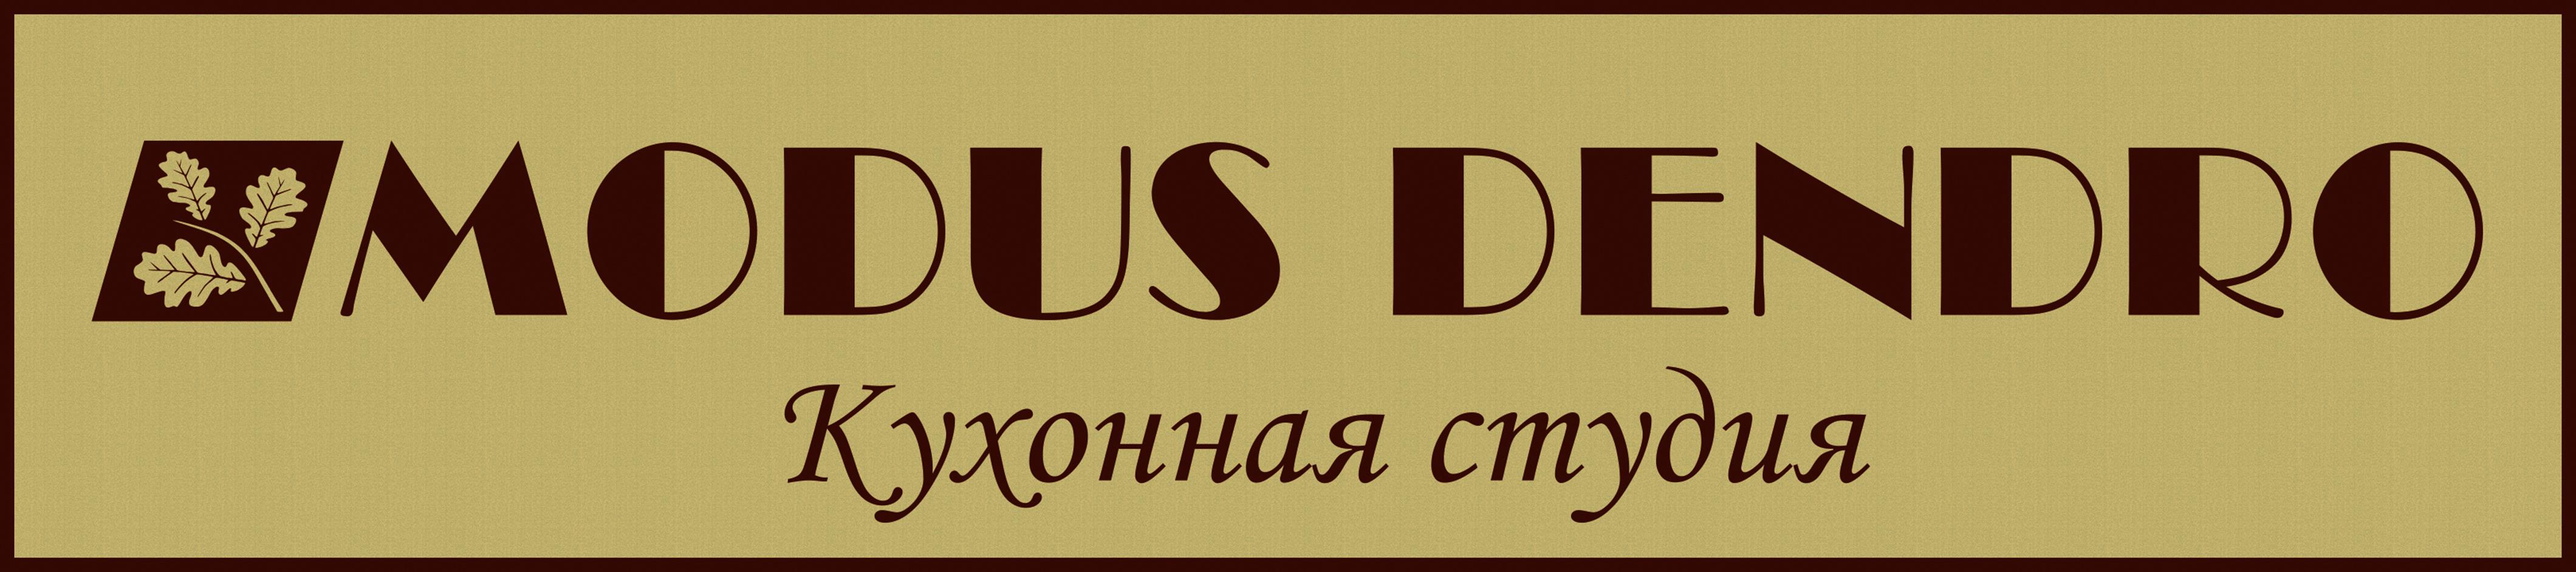 Кухни_MODUS-DENDRO_блок1